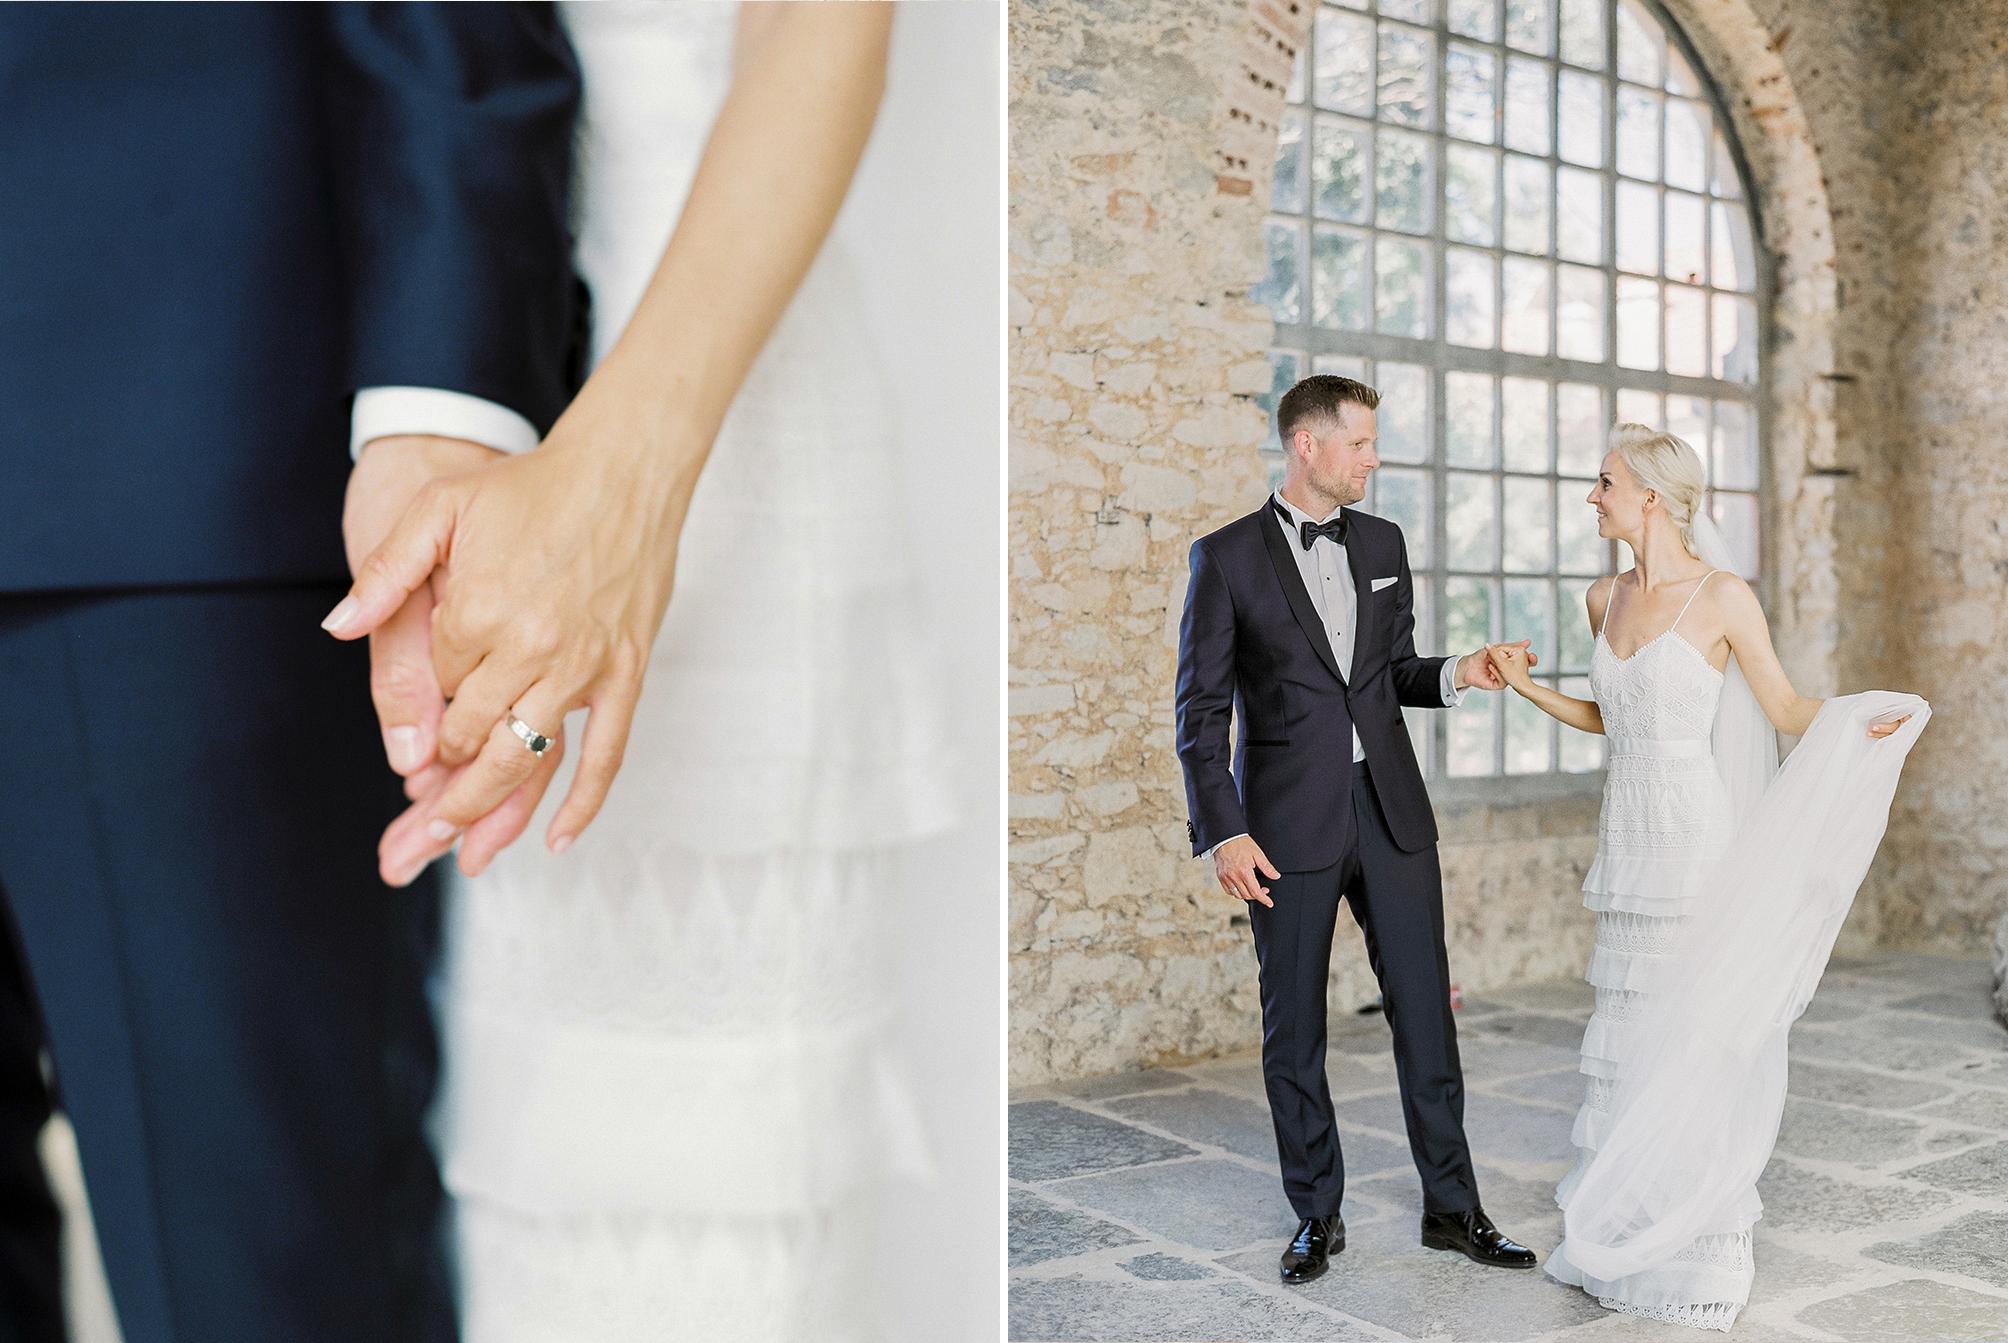 Nastia_Vesna_Photography_Wedding_Portugal_28.jpg